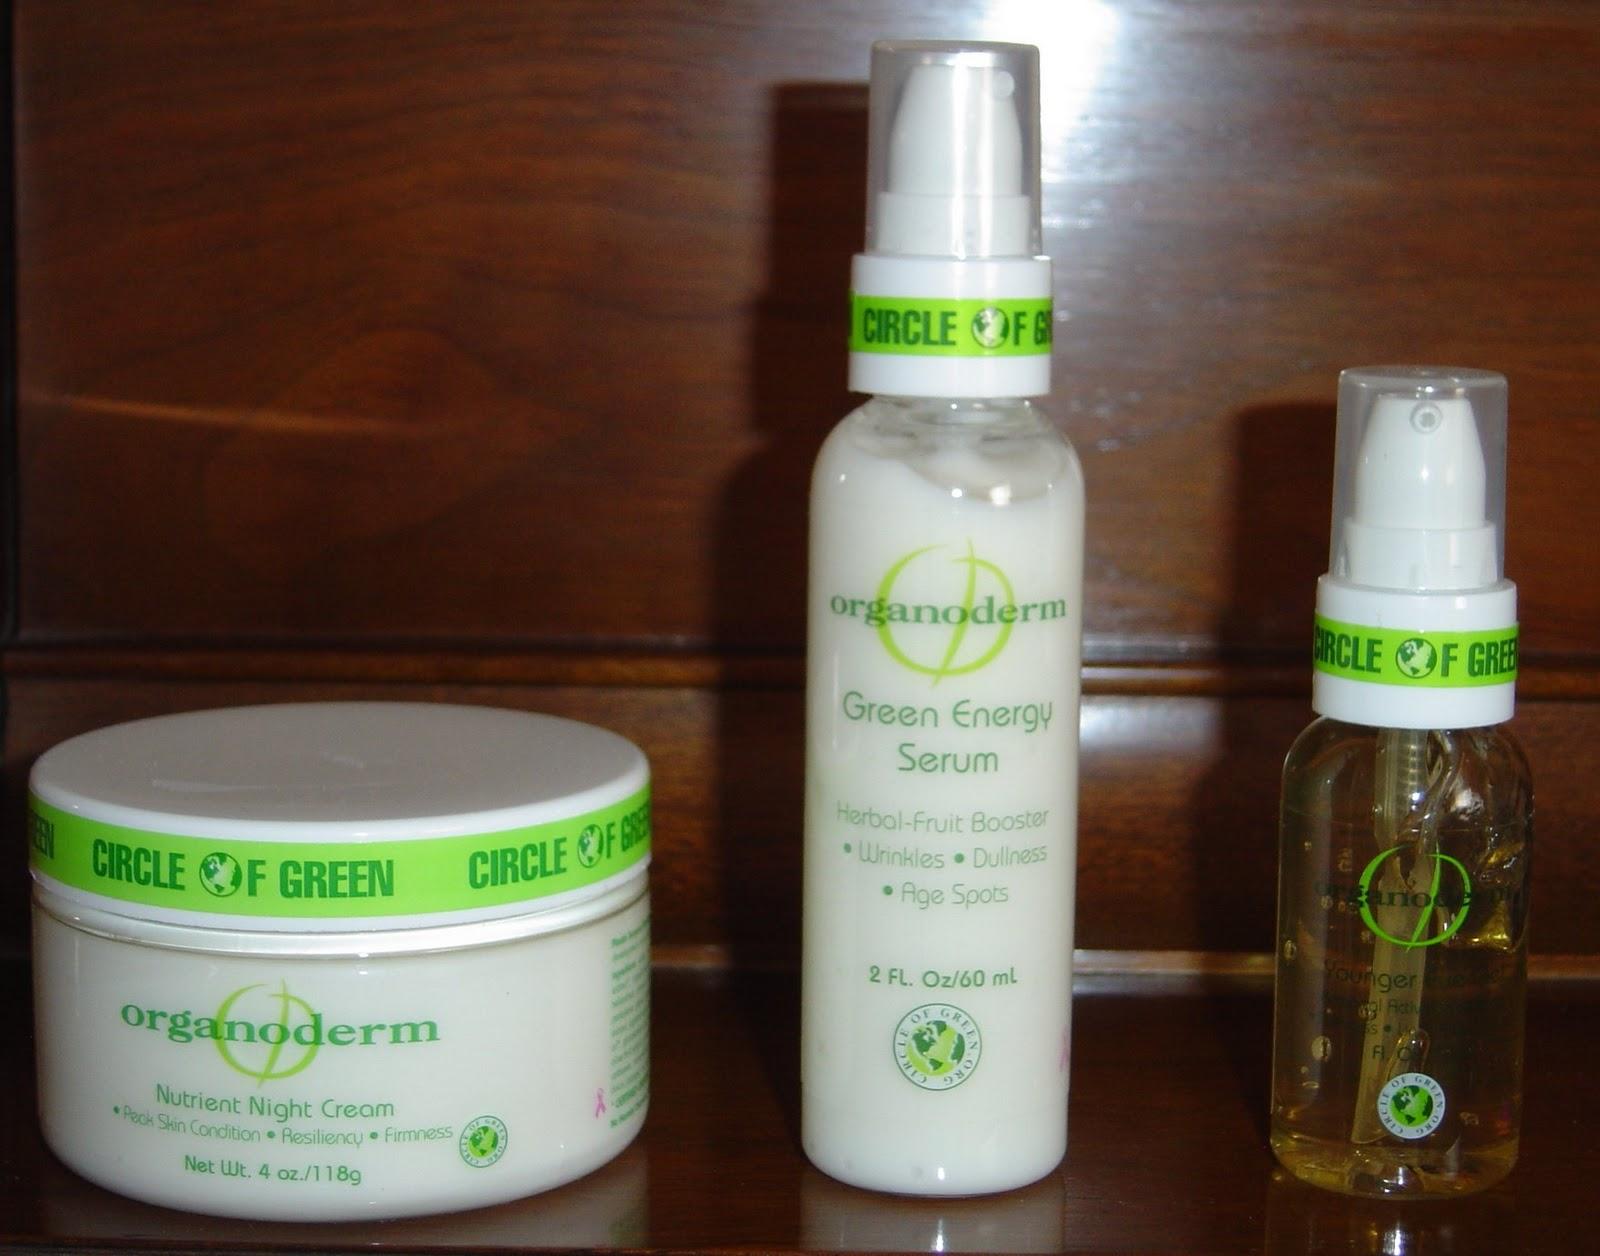 Organoderm Skin Care trio